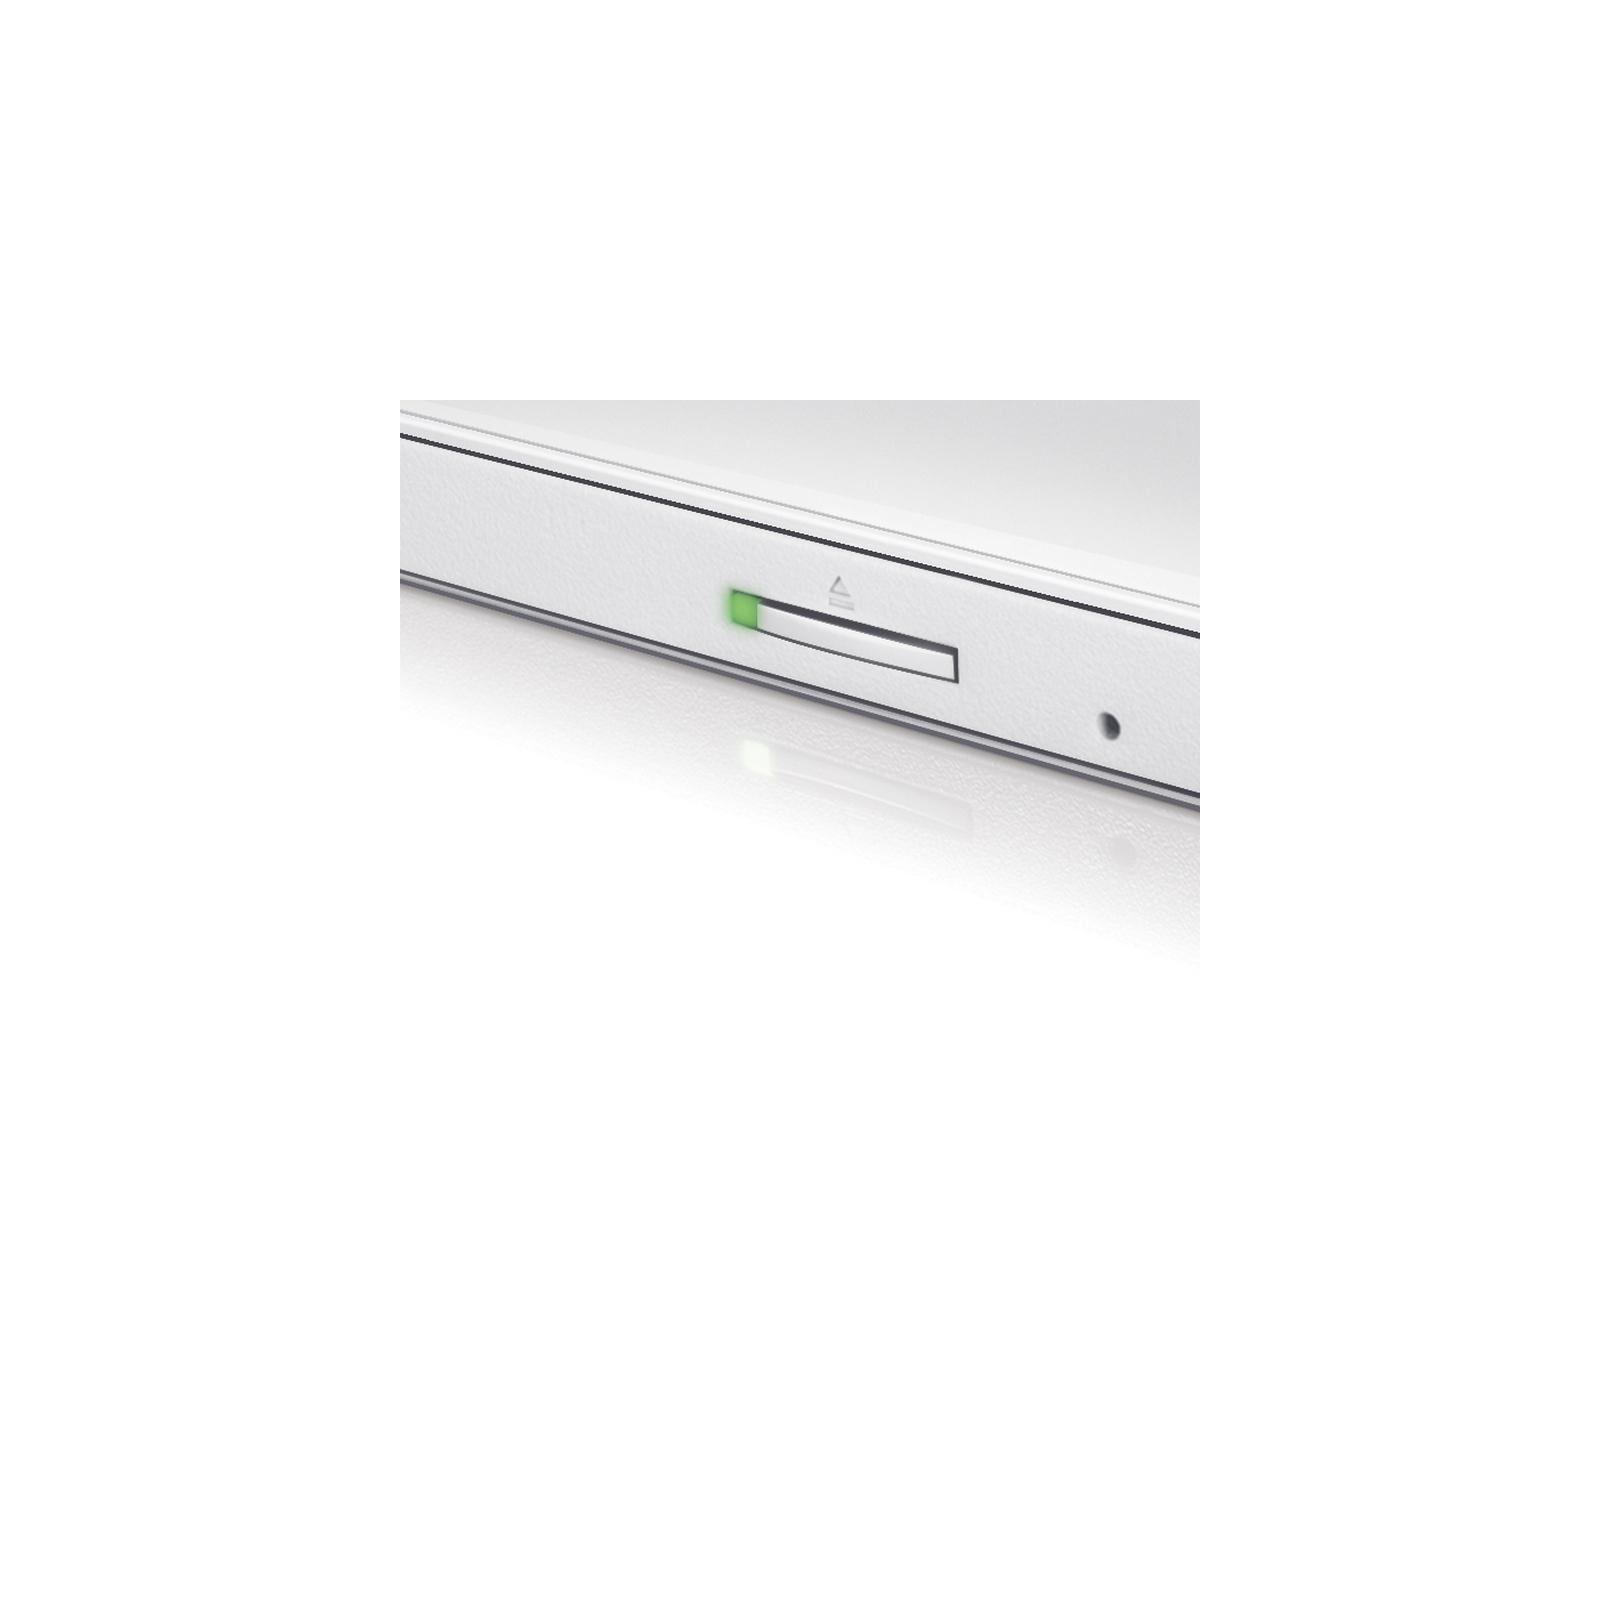 Оптический привод DVD±RW LG ODD GP57EW40 изображение 4